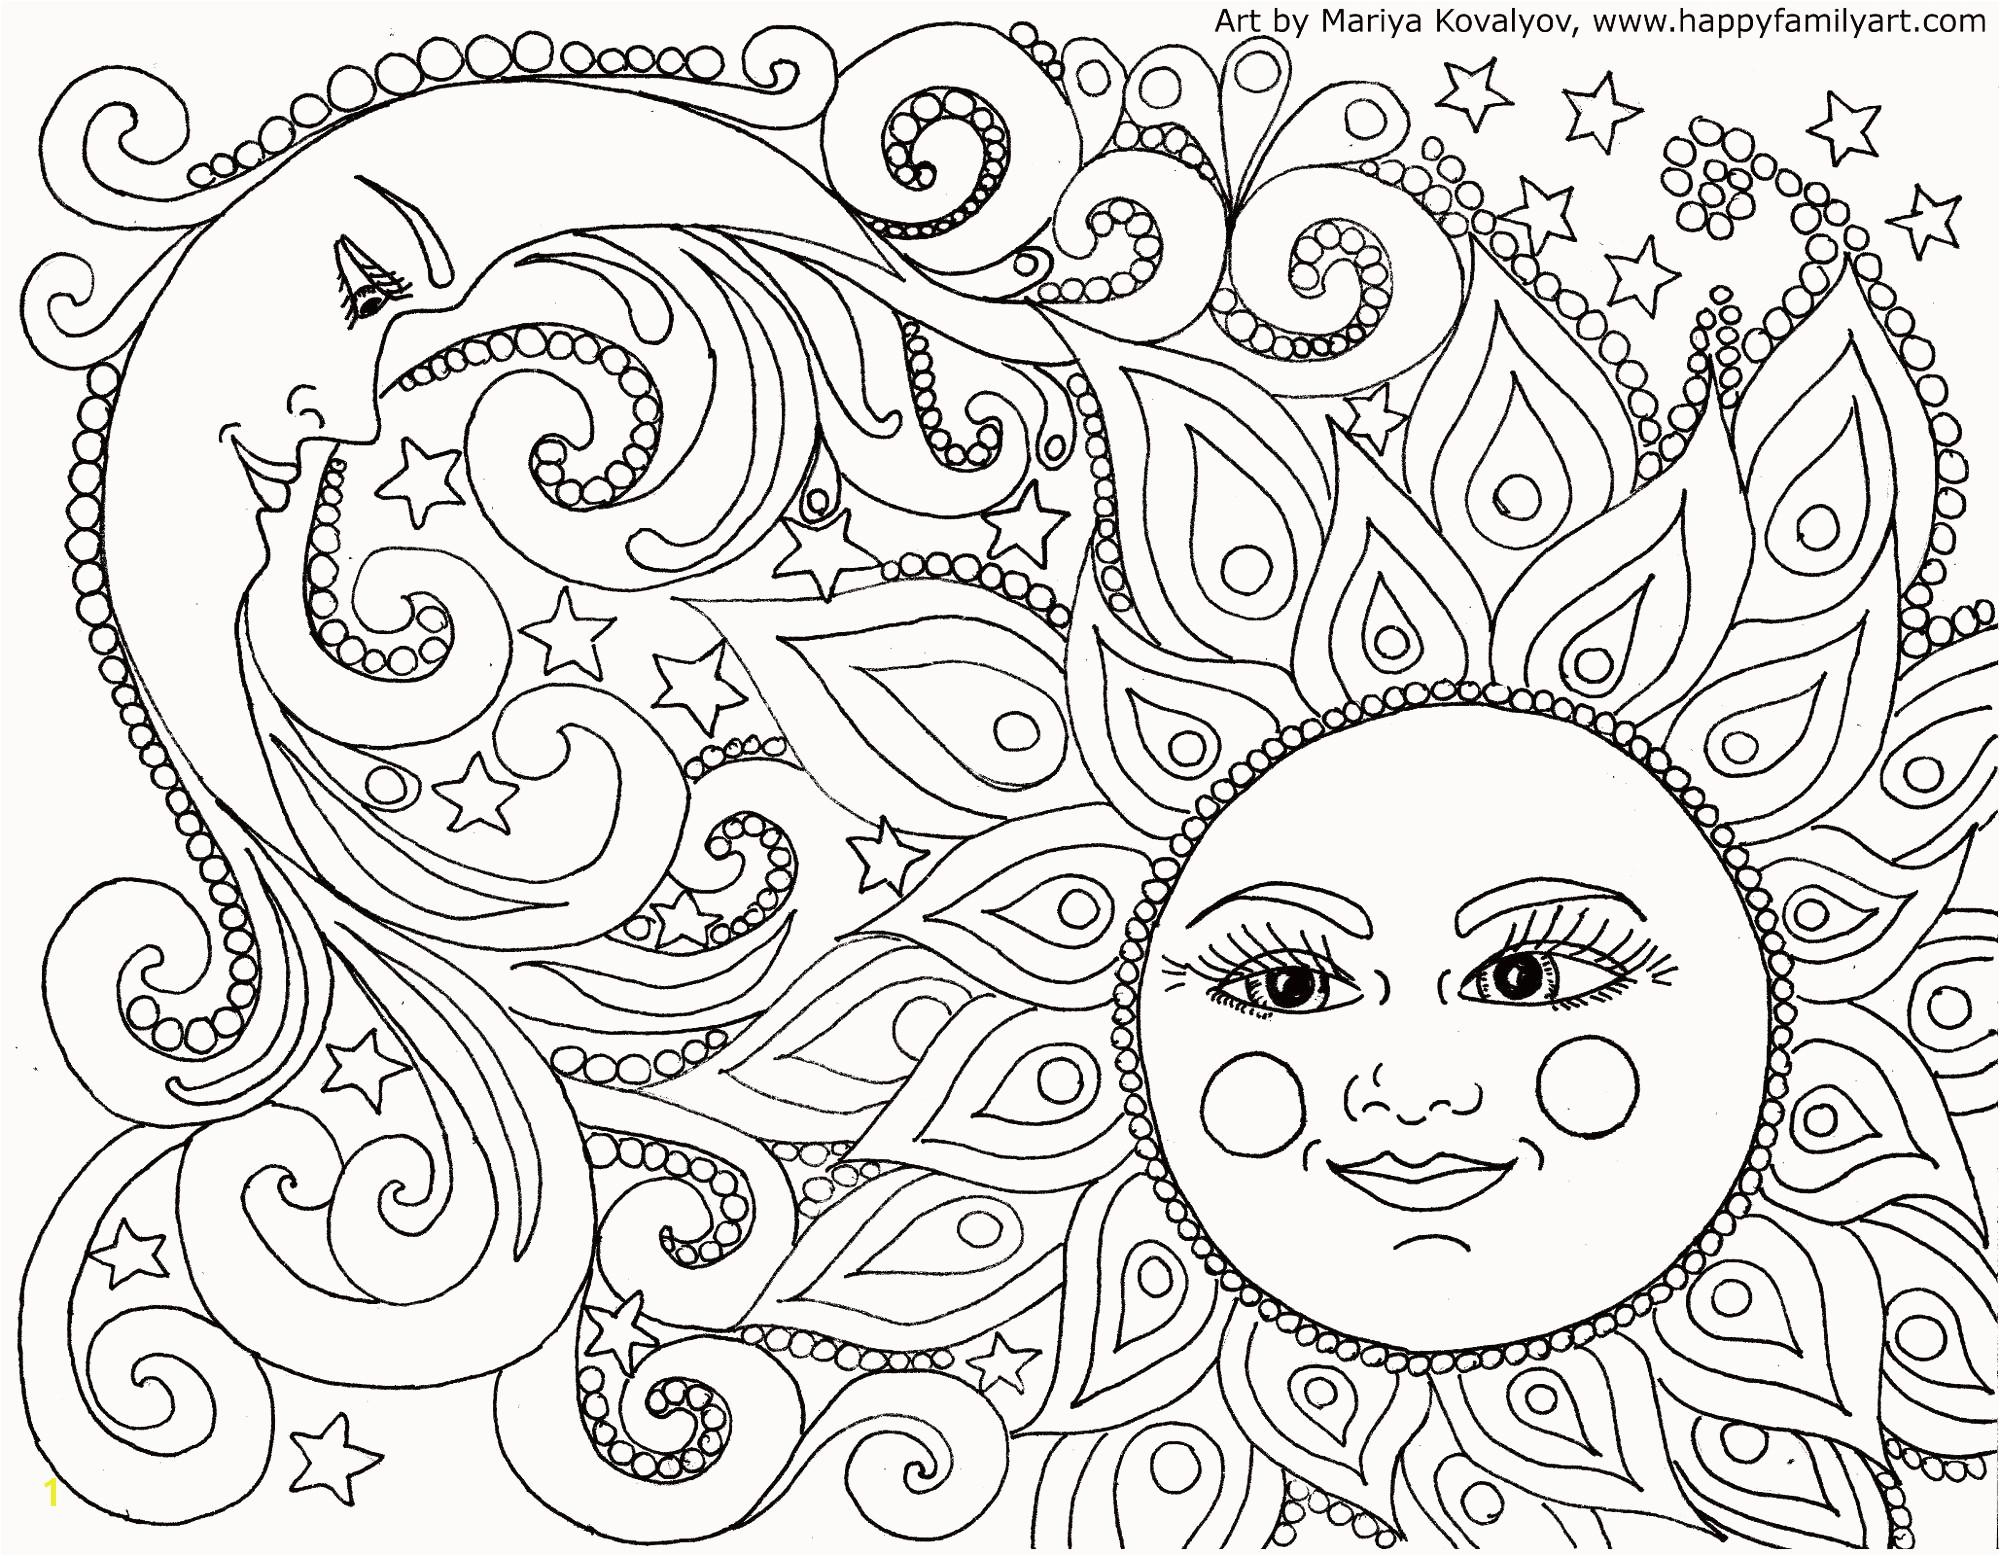 Mighty Raju Coloring Pages Printable Mandala Coloring Pages Luxury Mandala Coloring Pages